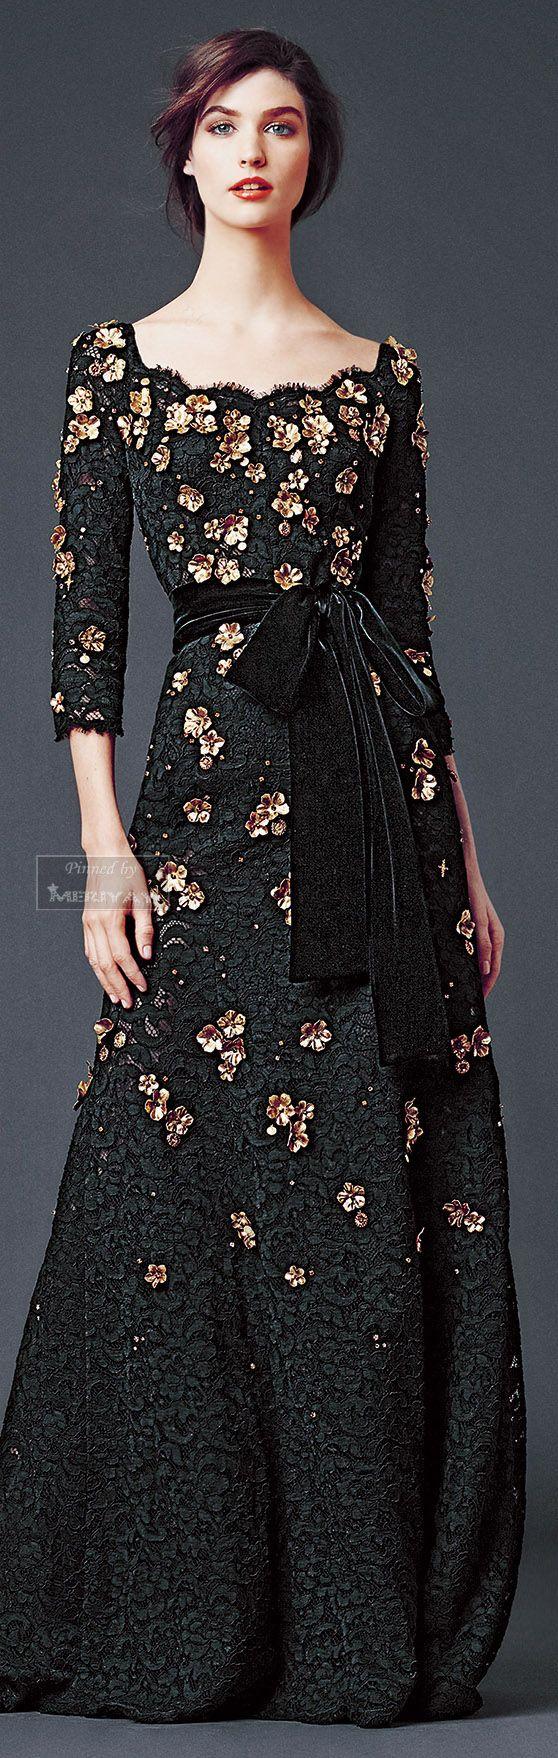 Dolce Gabbana - Collection Fall Winter 2014 2015.